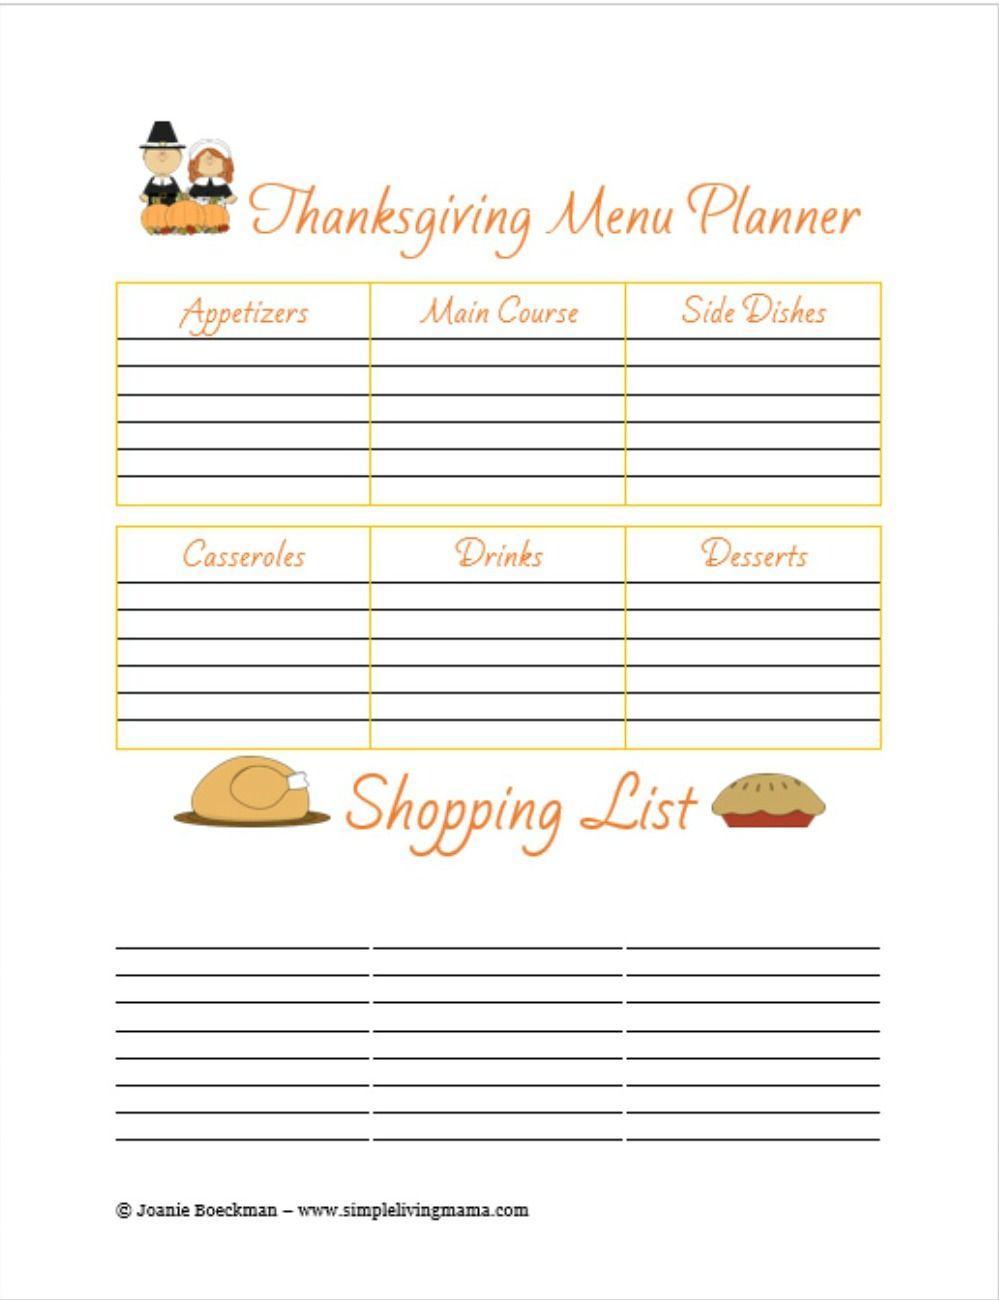 Free Printable Thanksgiving Menu Planner  Thanksgiving Menu